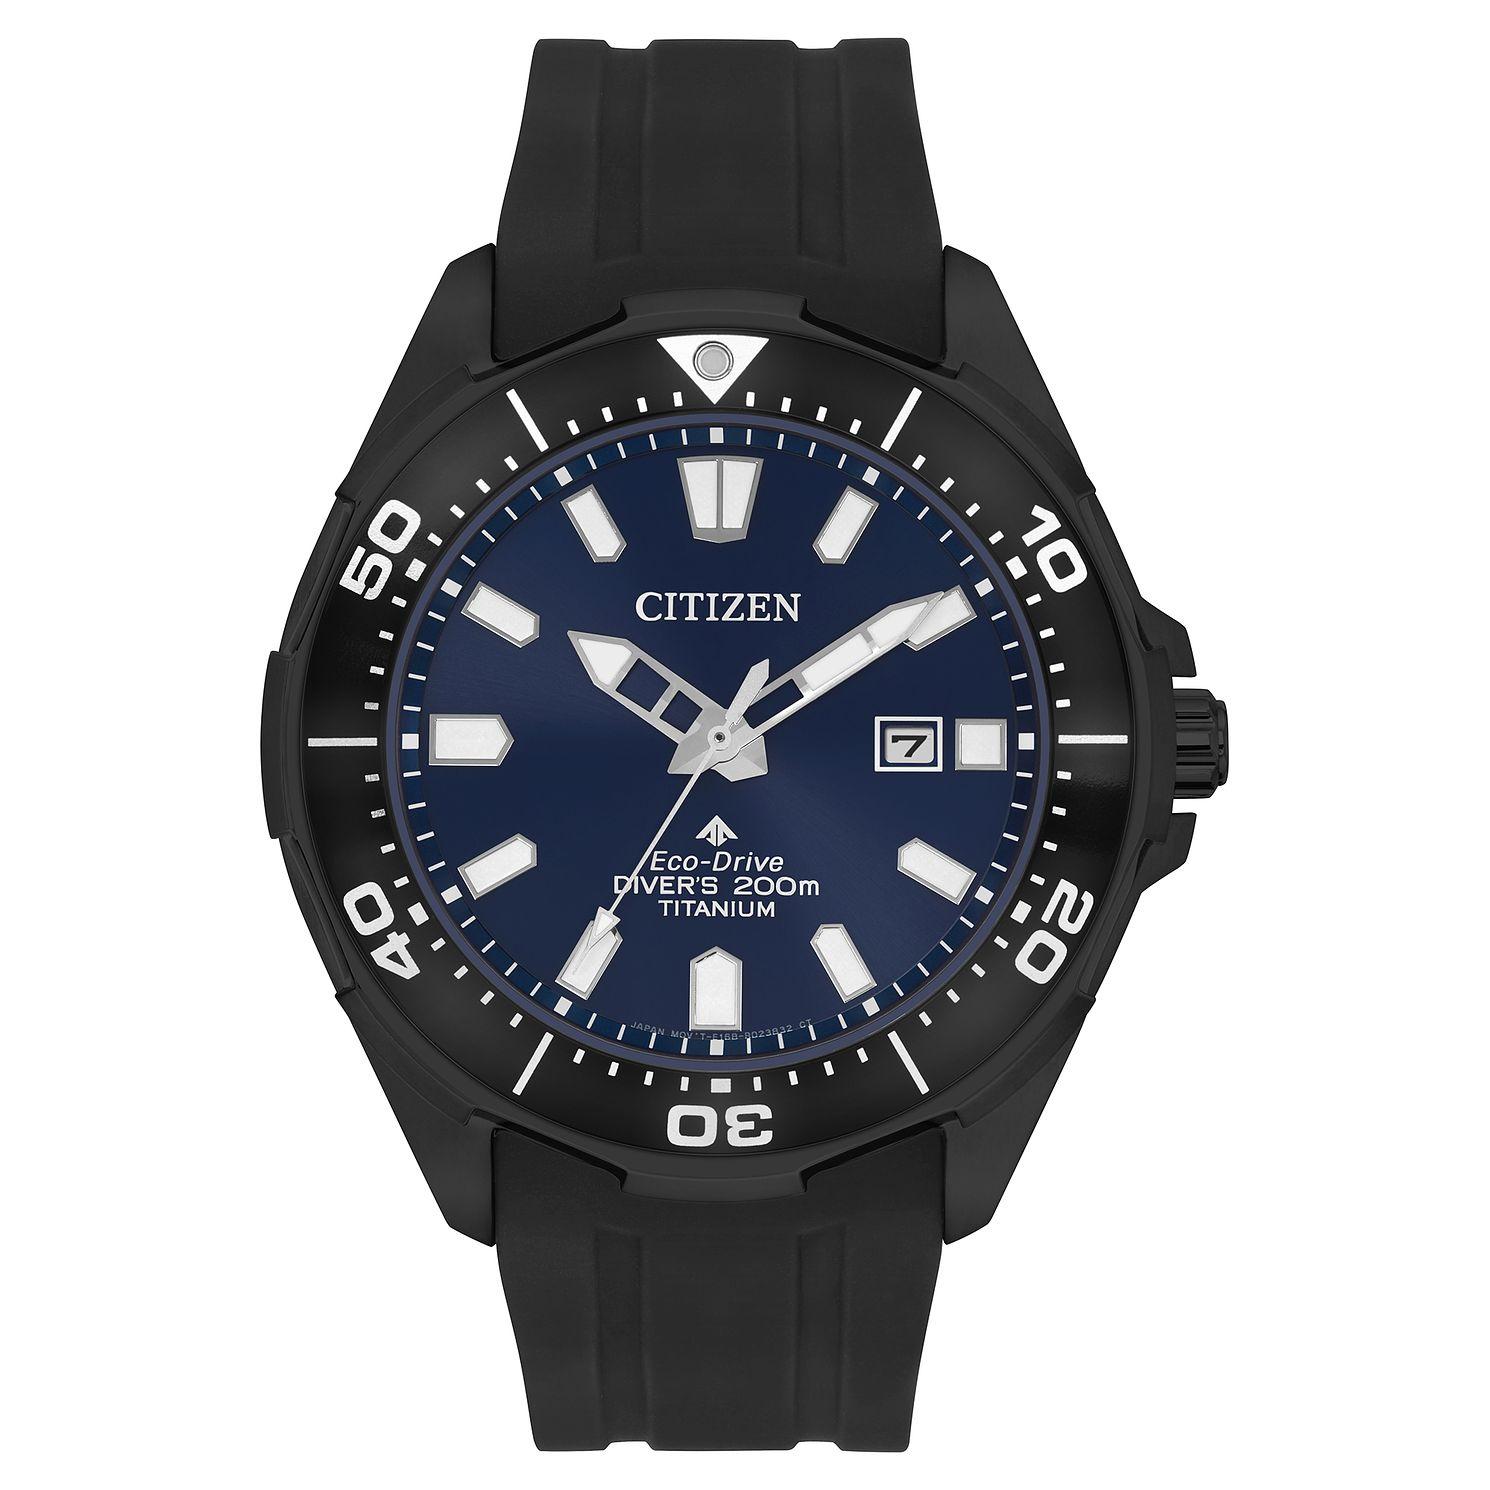 Citizen Eco-Drive Promaster Titanium Marine Black Watch, £160 with code at H.Samuel